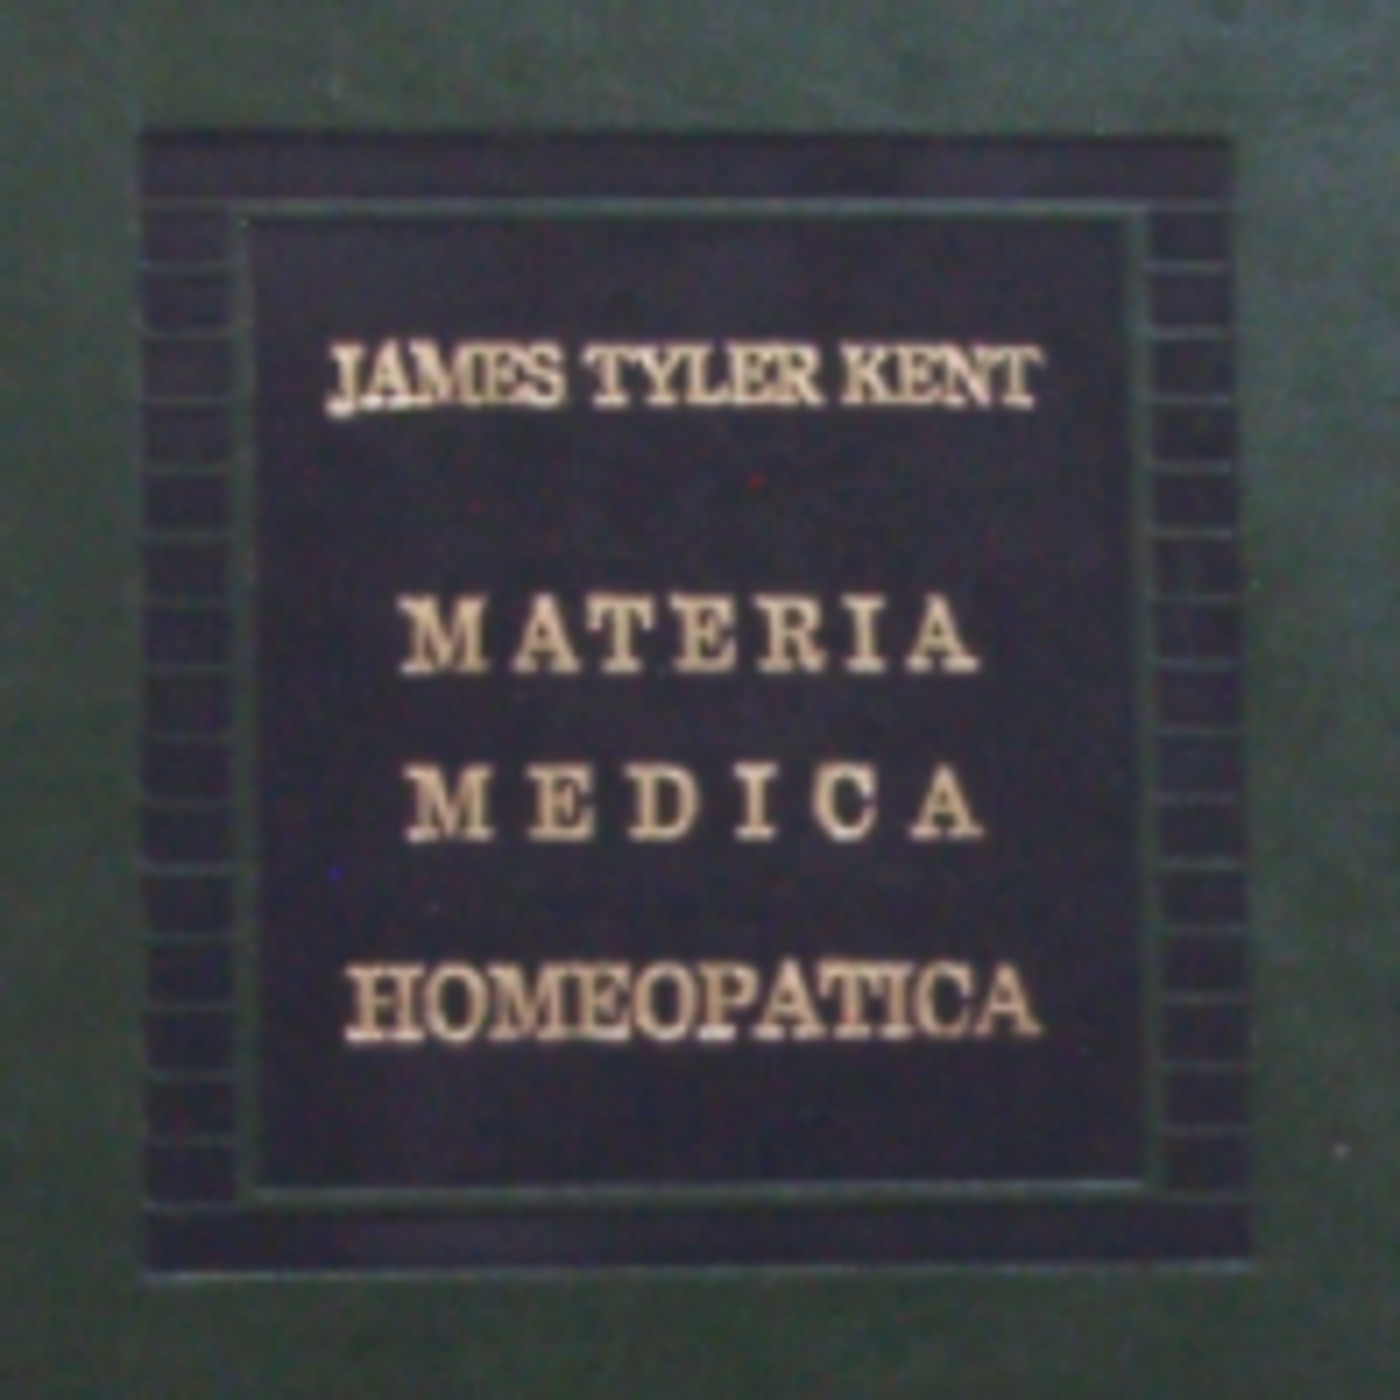 Benzoic Acid. - ABC Homeopathy